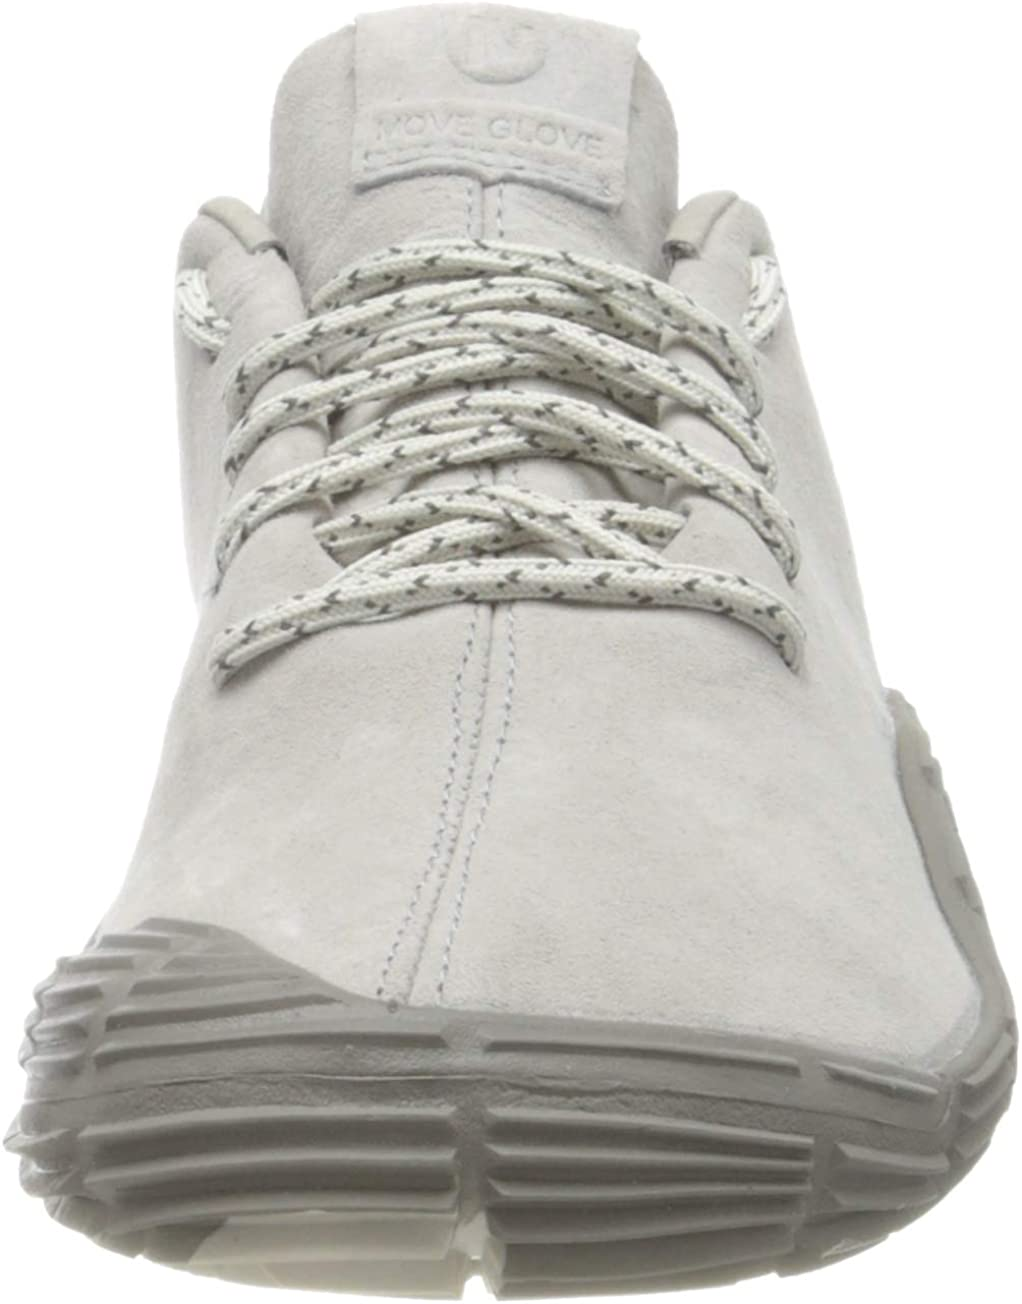 Zapatos para Mujer Merrell Move Glove Suede